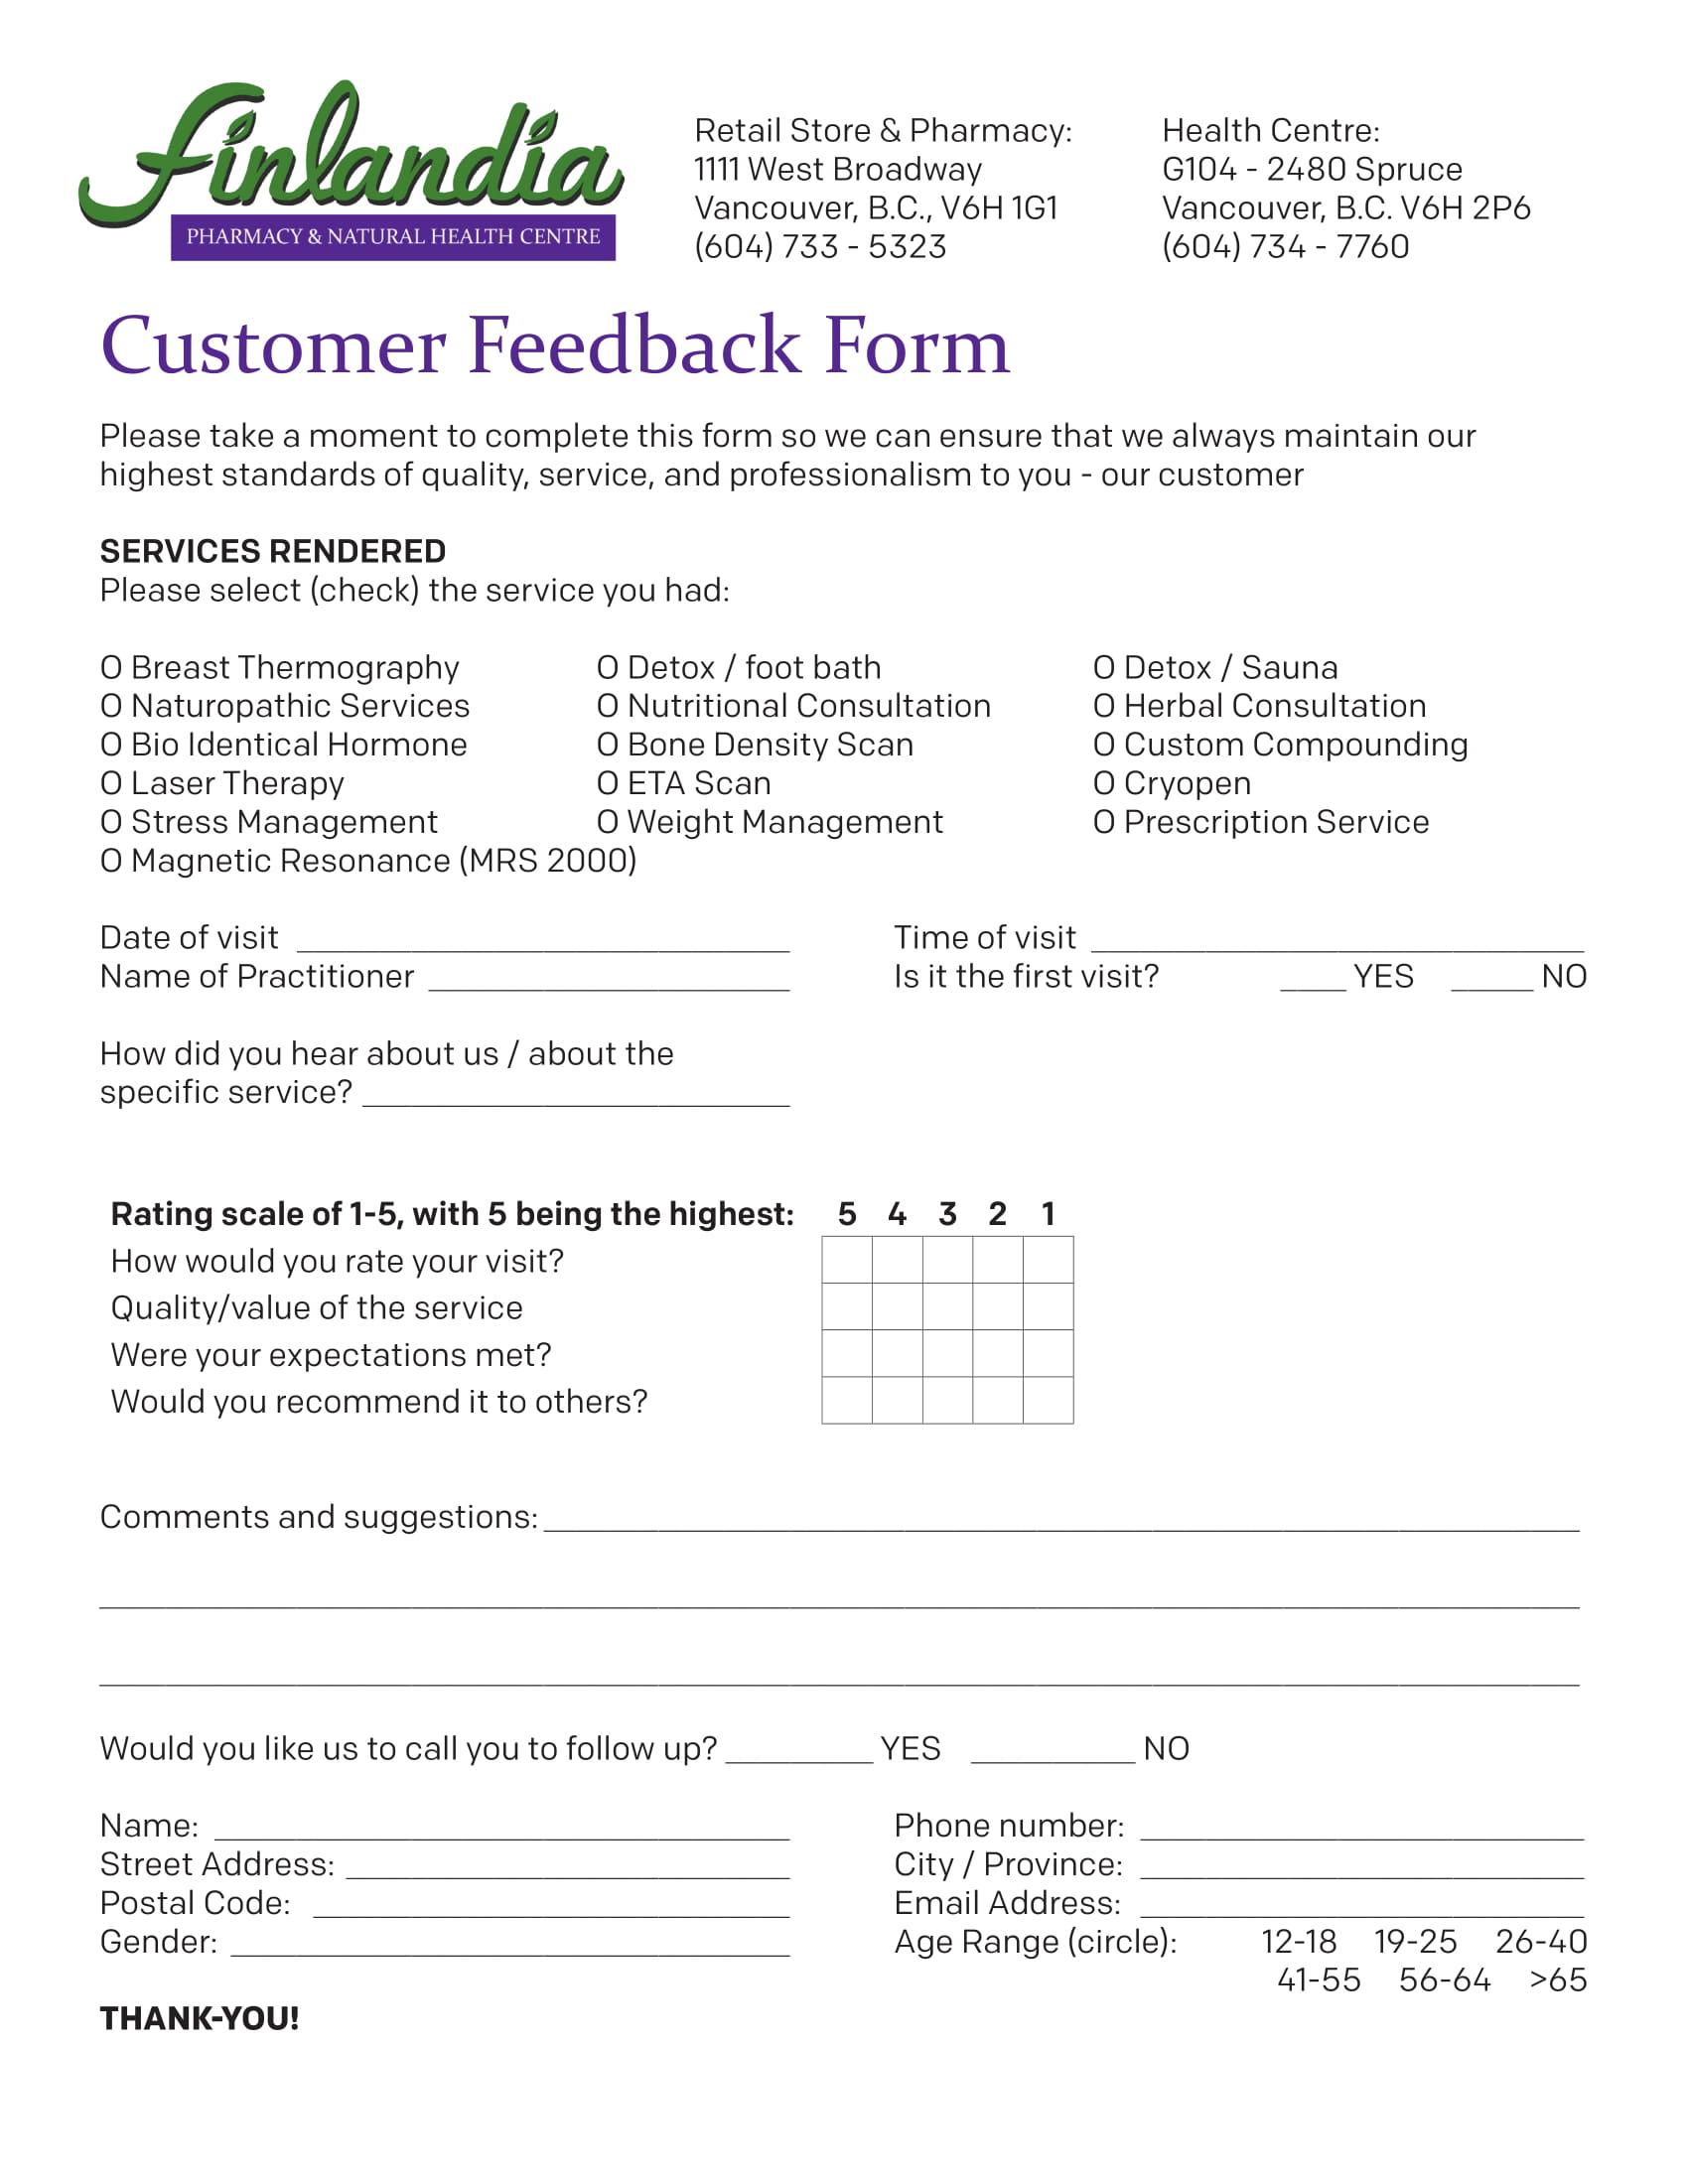 pharmacy customer feedback form 1